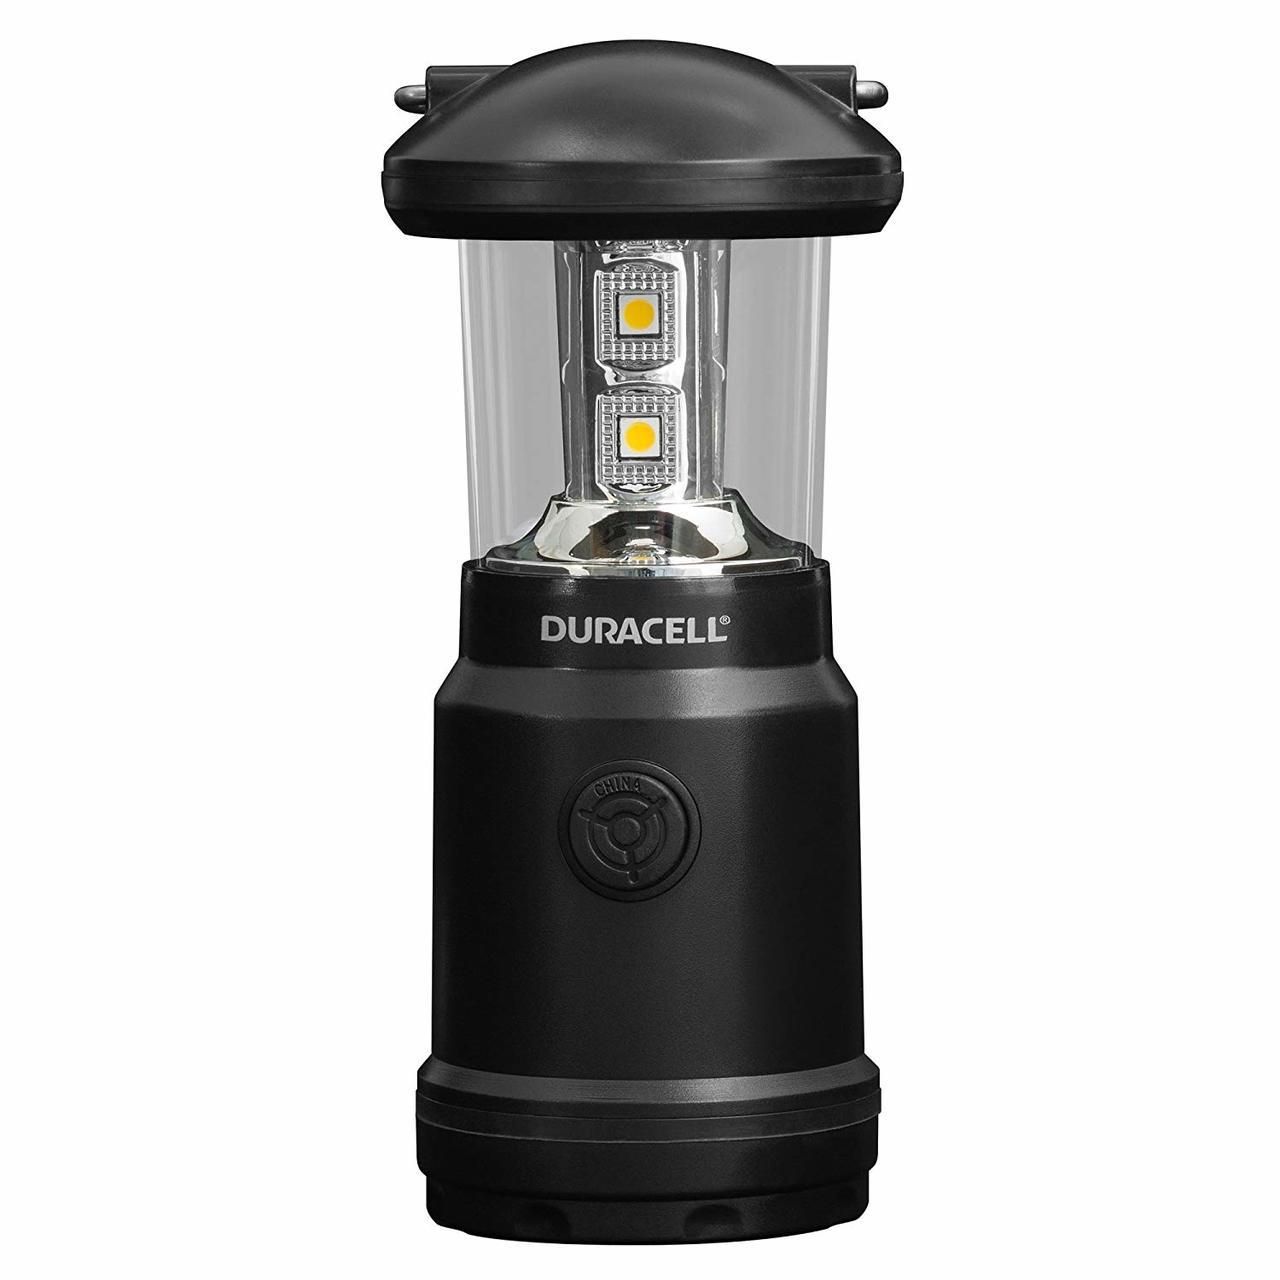 DURACELL LANTERN EXPLORER 8x LED + 3 AA BATTERIES